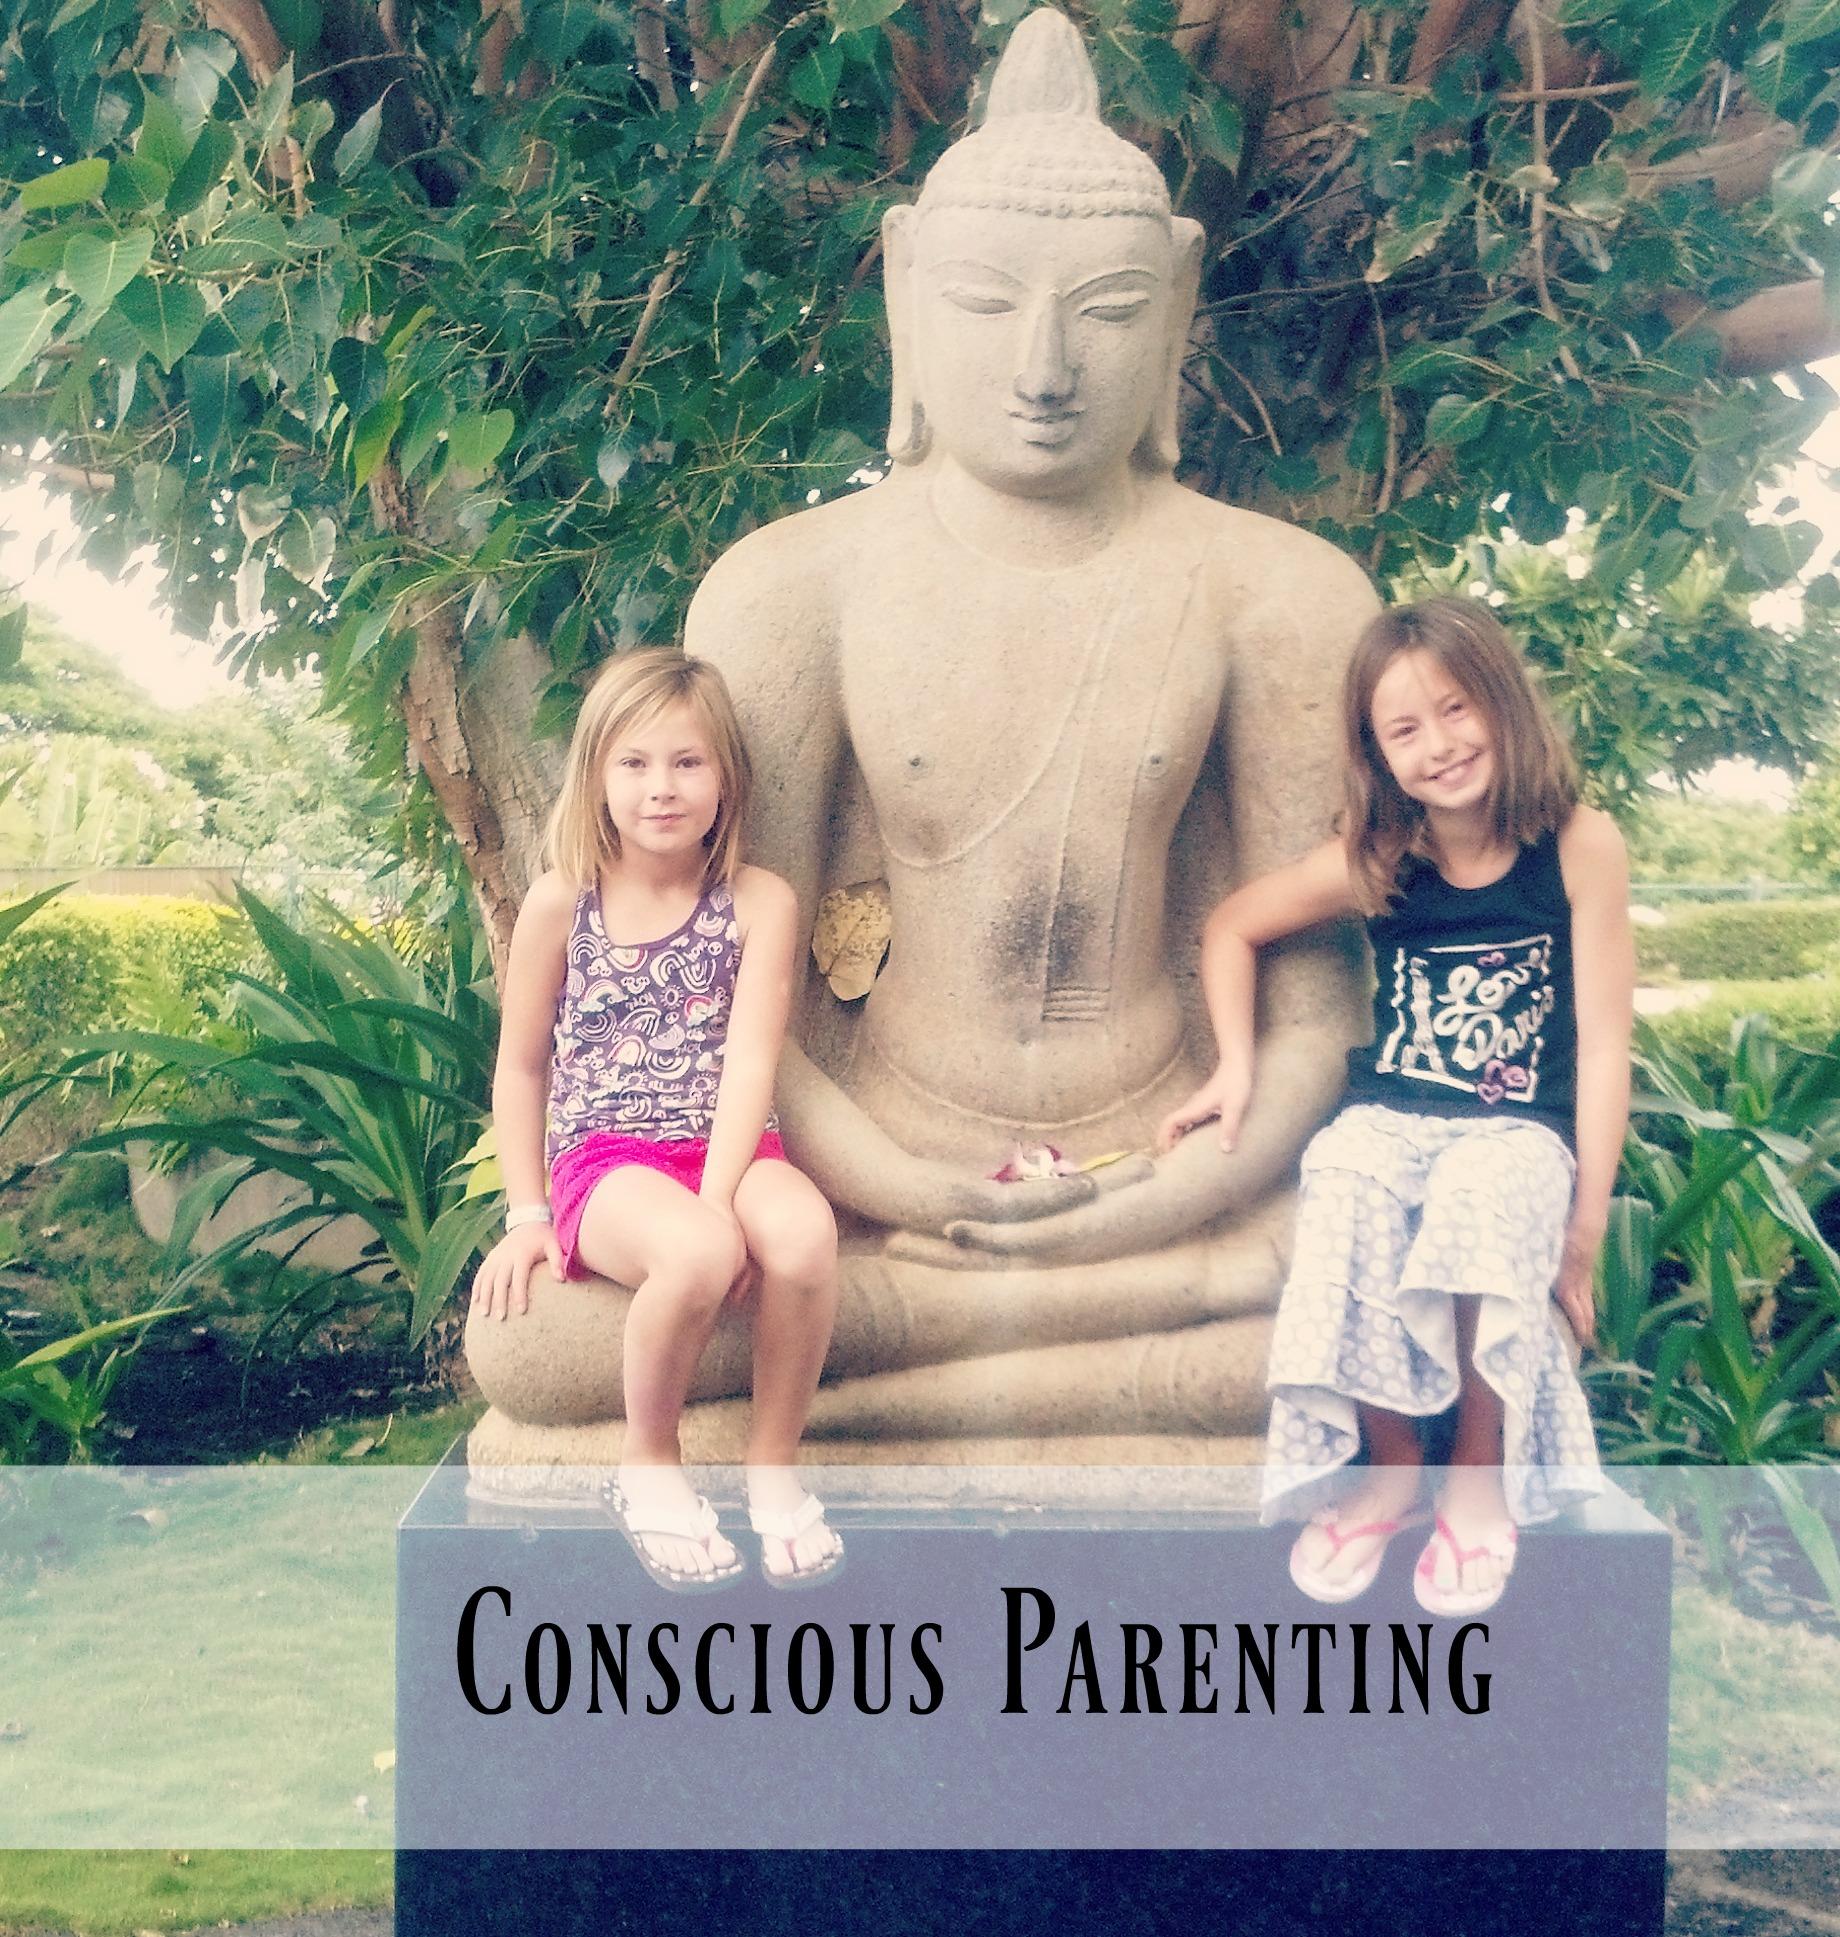 TIWA_conscious parenting.jpg